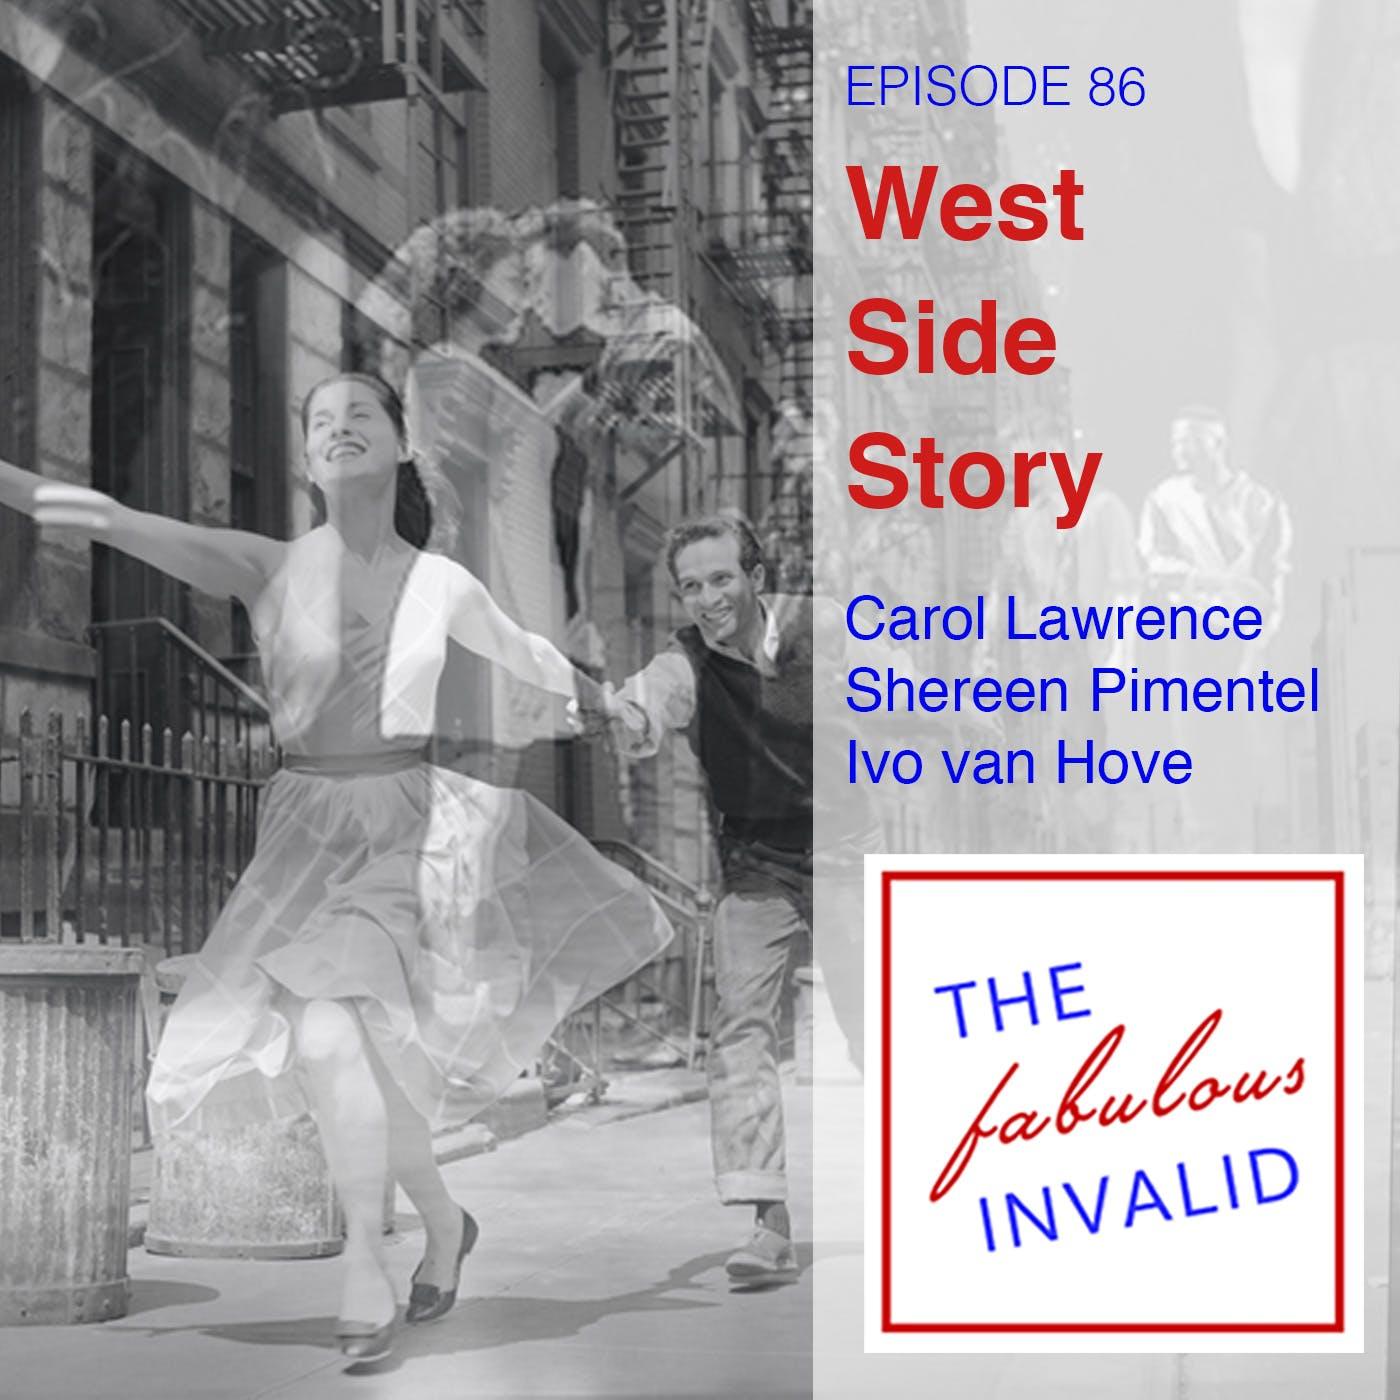 Episode 86: West Side Story